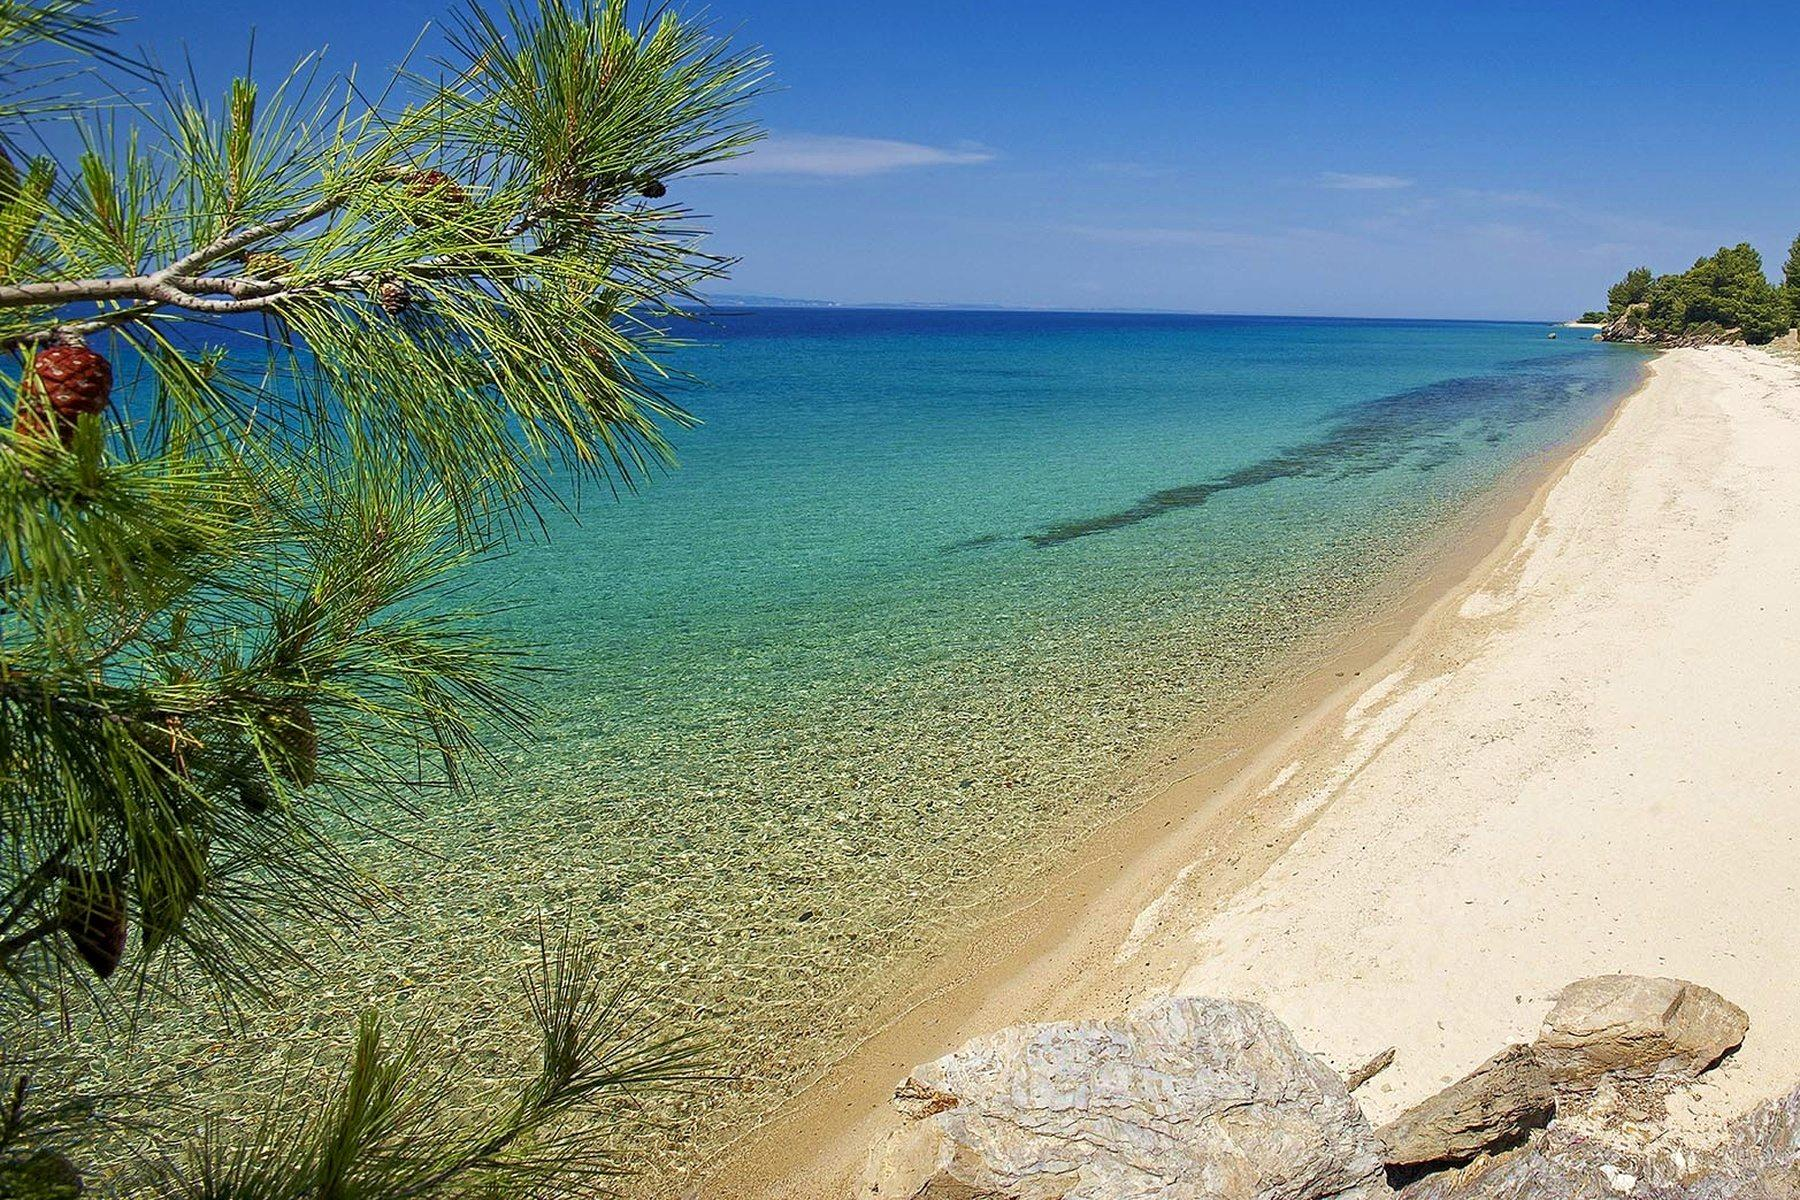 http://www.discovergreece.com/en/mainland/macedonia/halkidiki/best-beaches-in-halkidiki